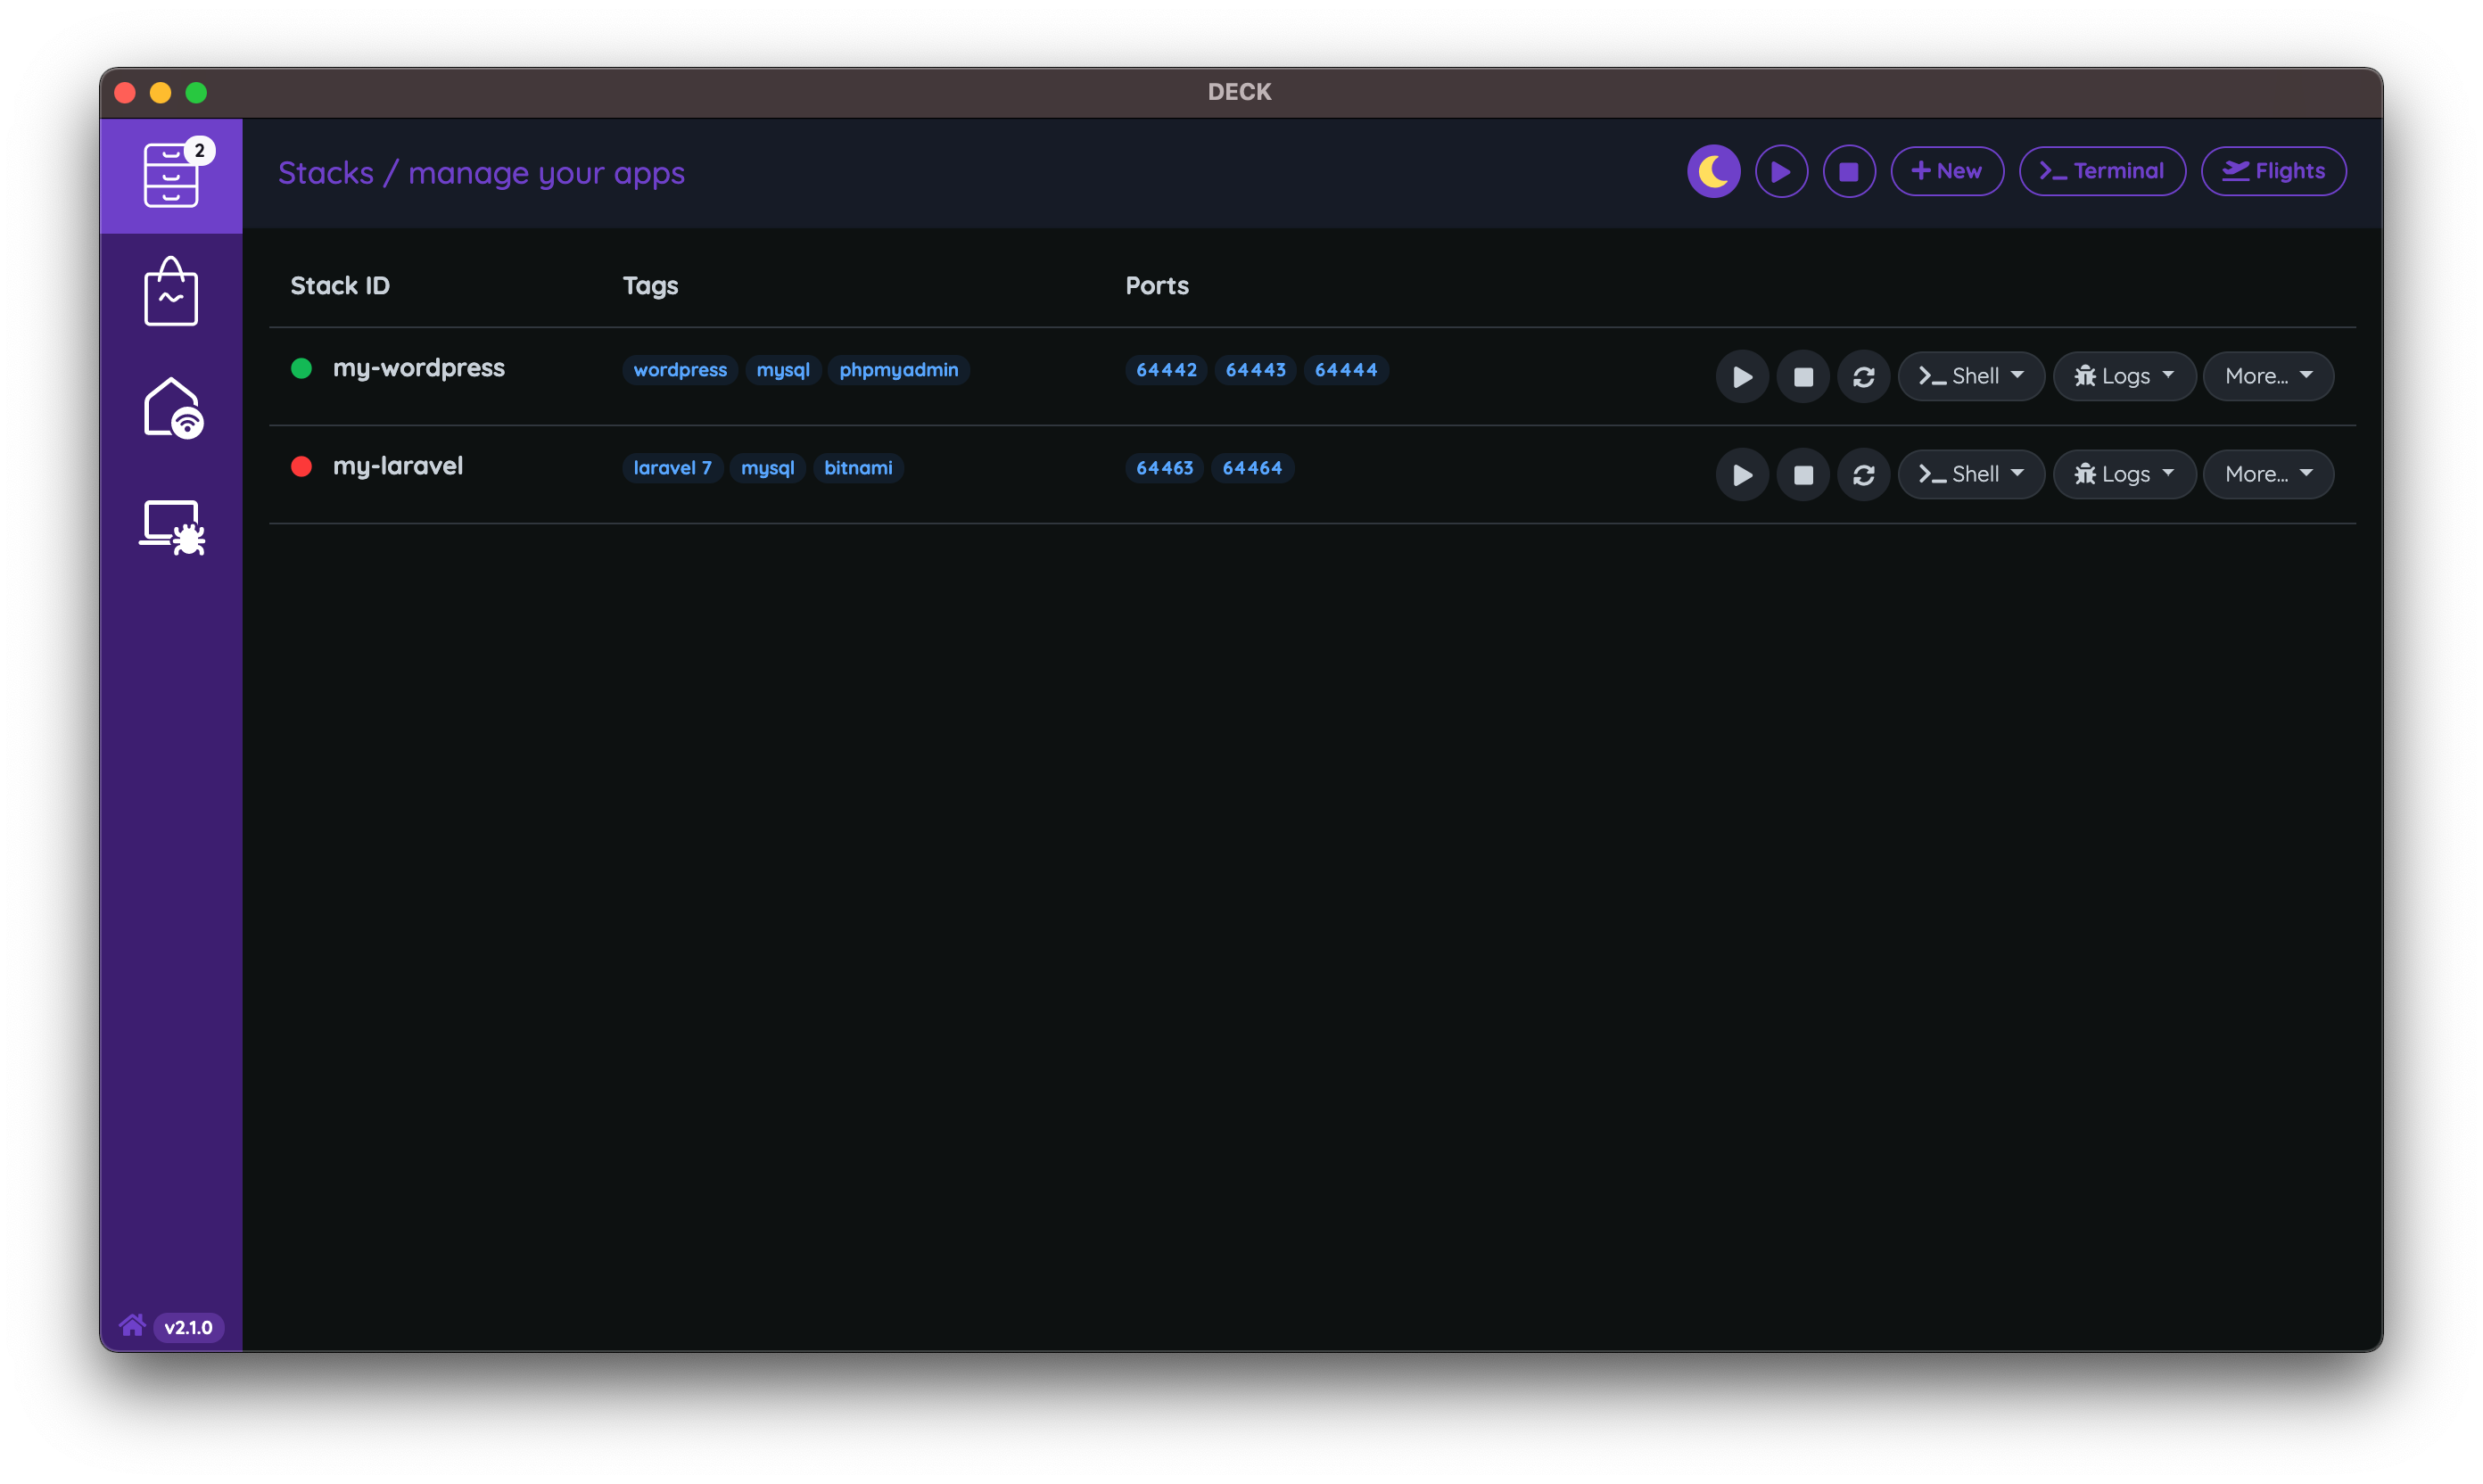 DECK Dark Mode Screenshot